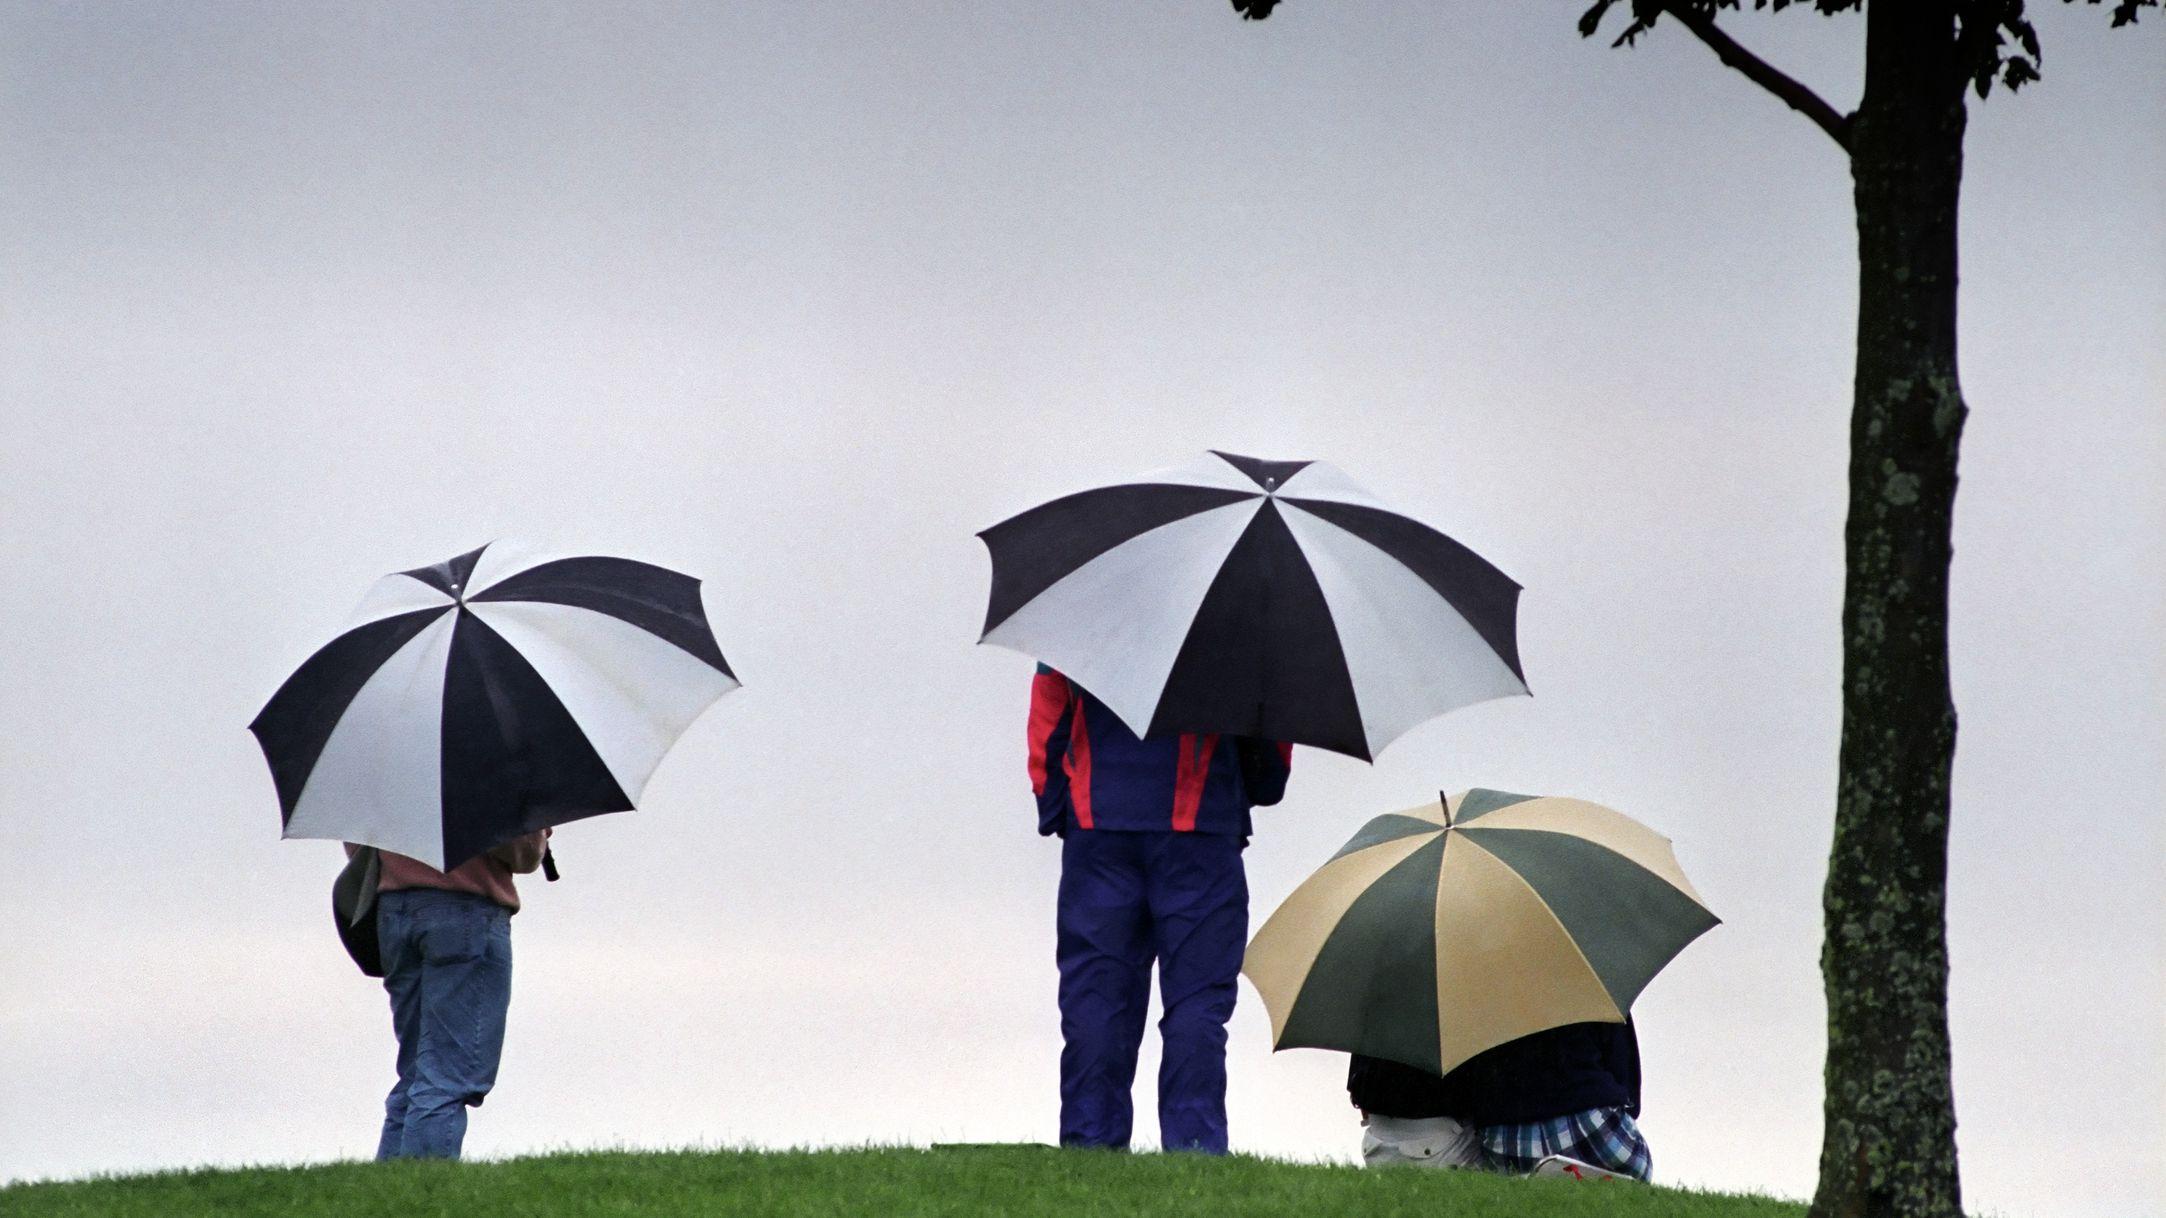 6eed9a6e0 The 7 Best Golf Umbrellas of 2019